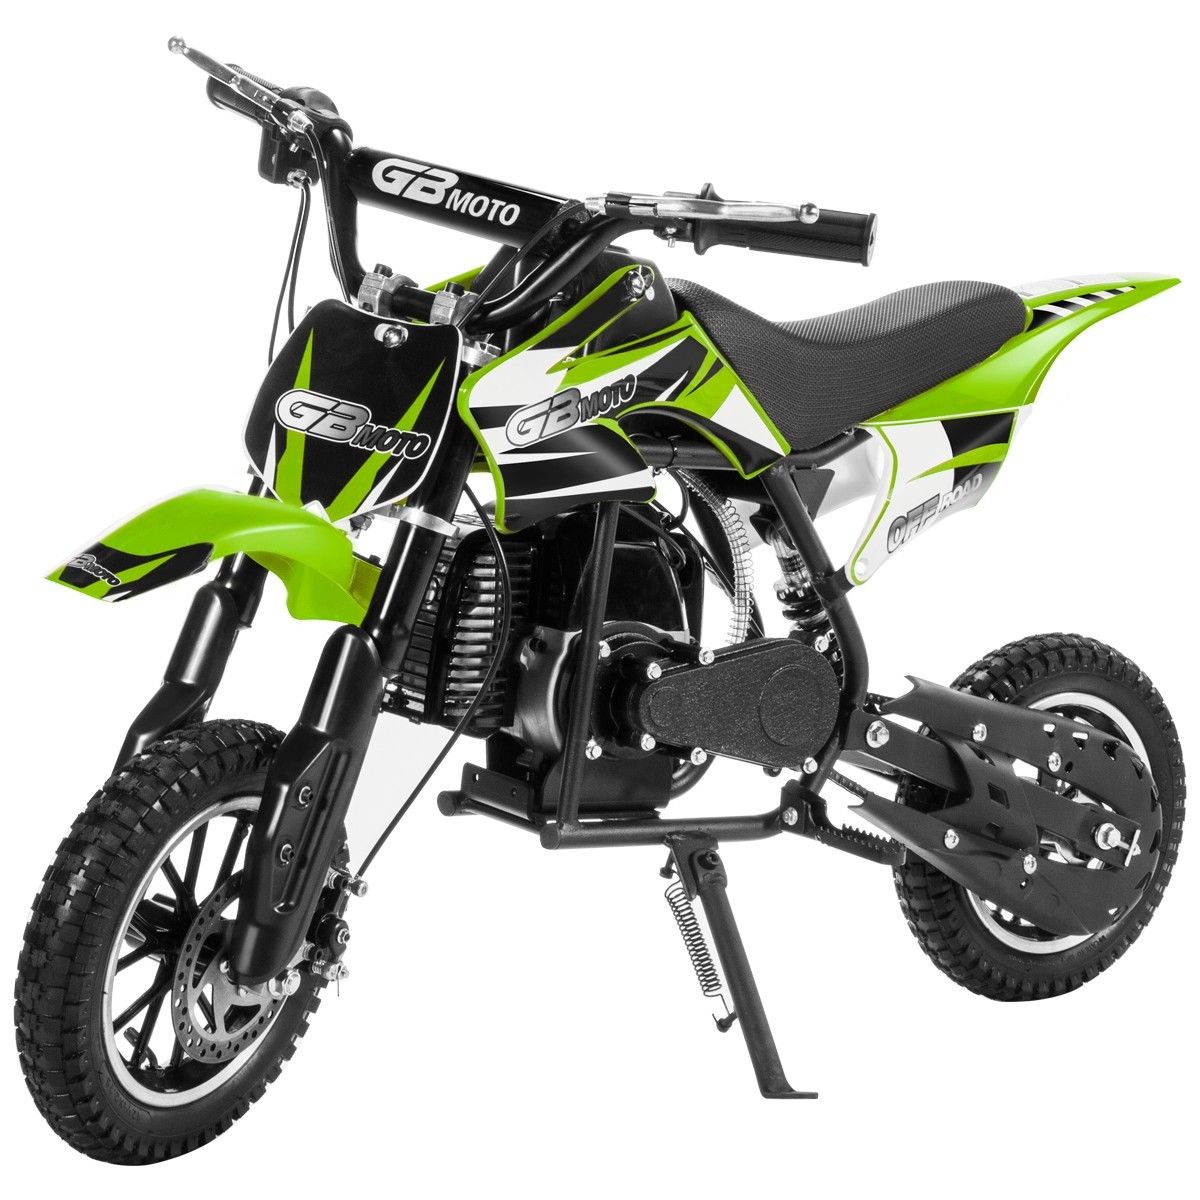 49cc 2-Stroke Gas Motorized Mini Dirt Bike Pocket Bike Pit S